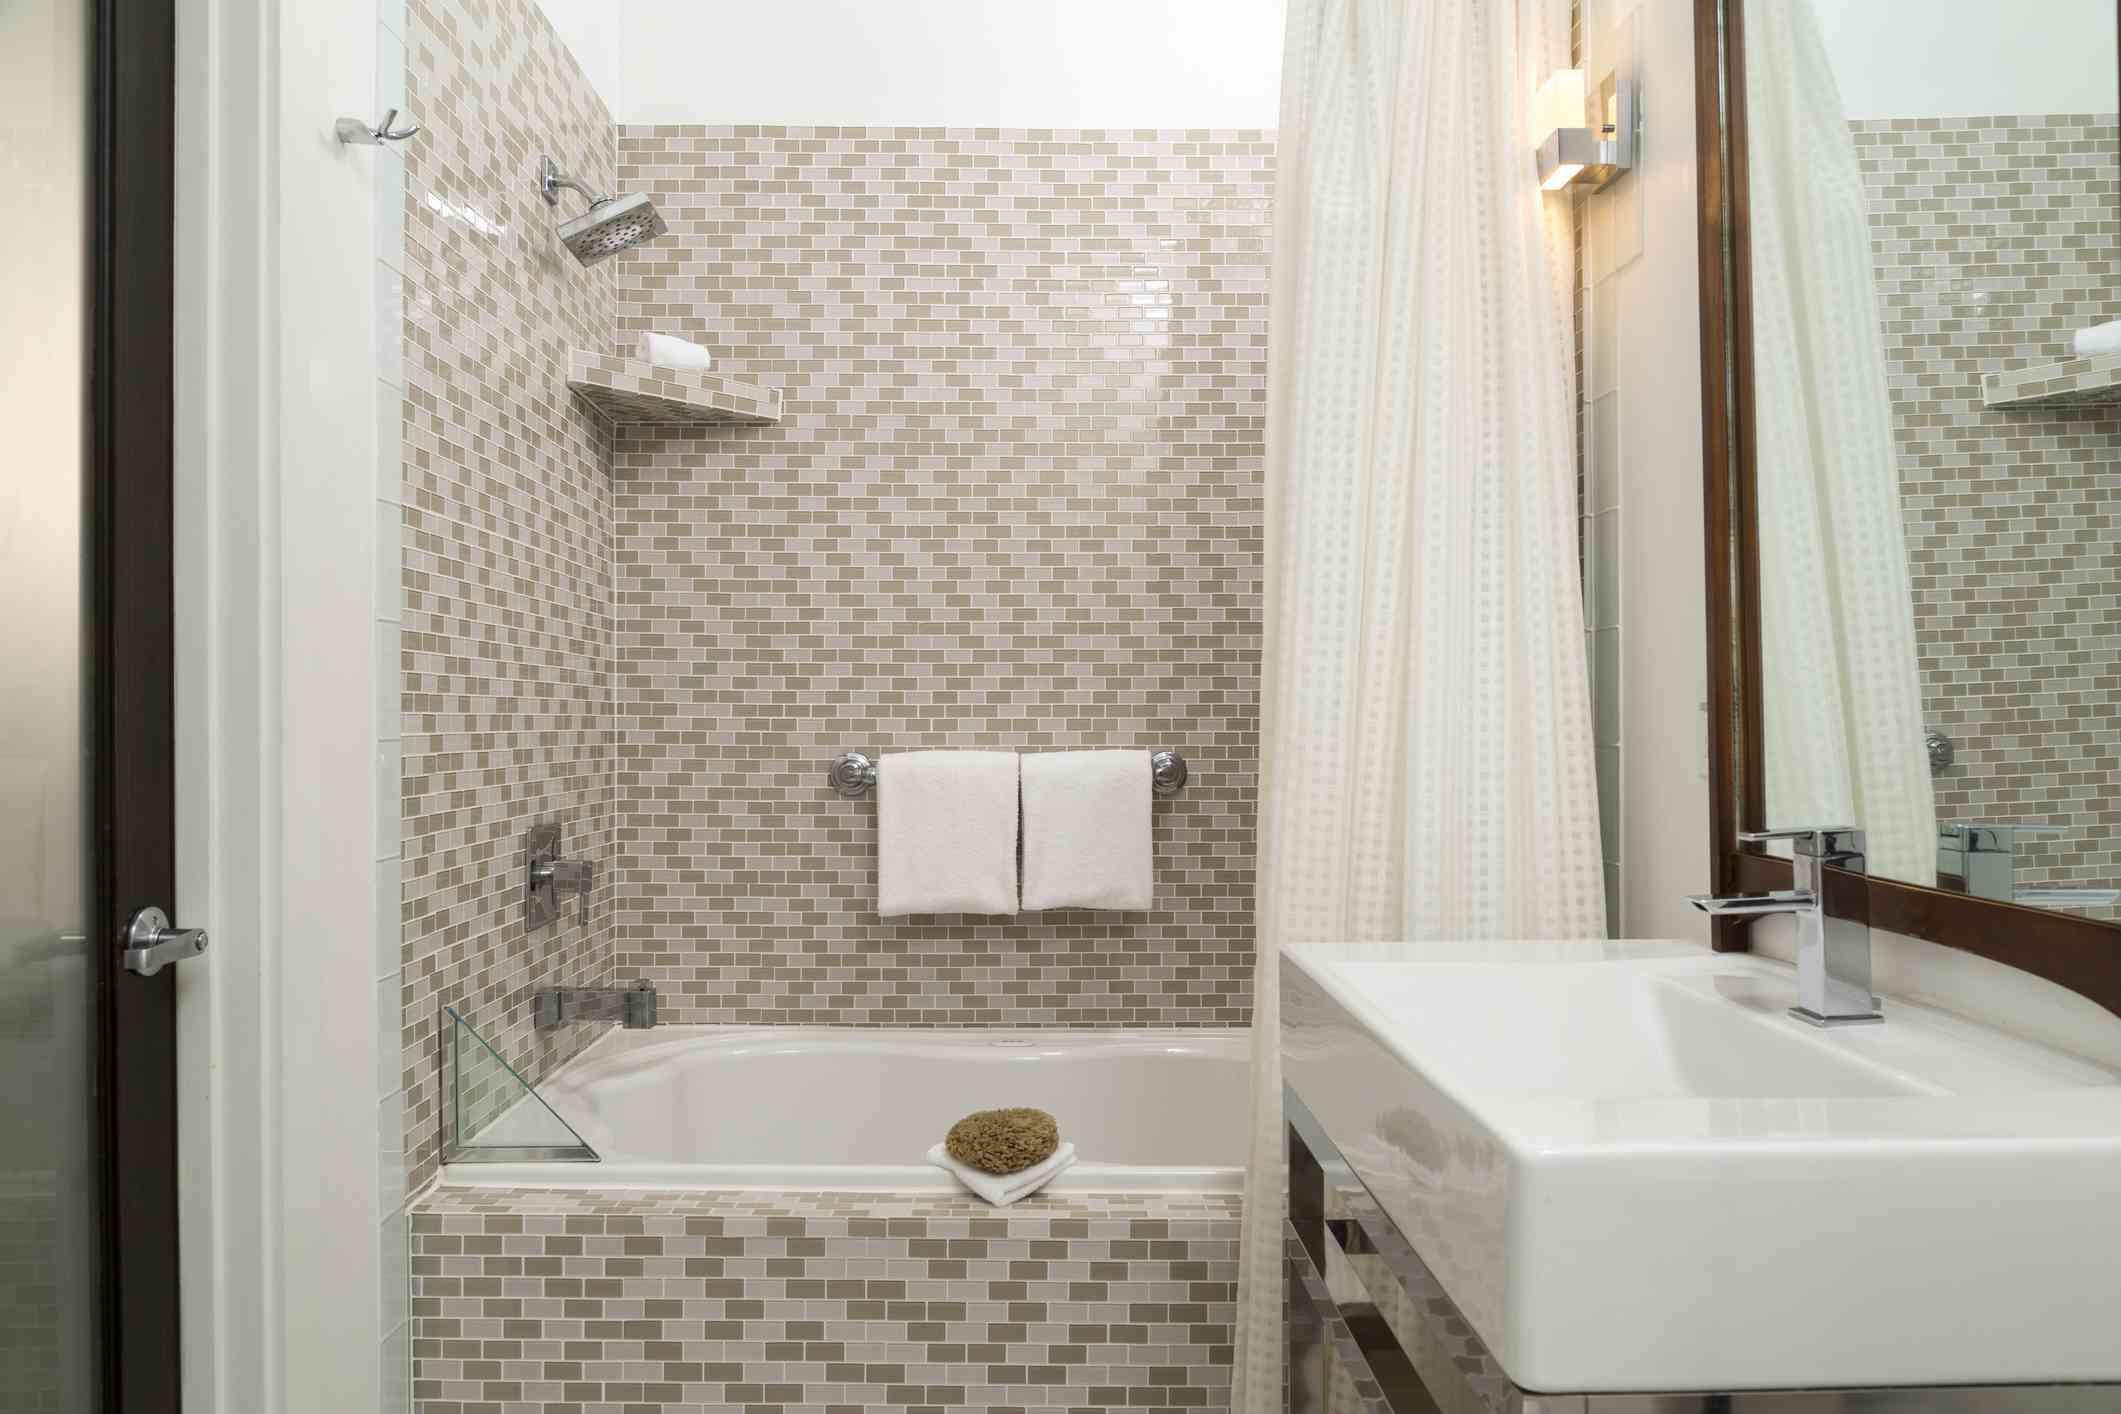 Modern tiled bathroom with sink and vanity